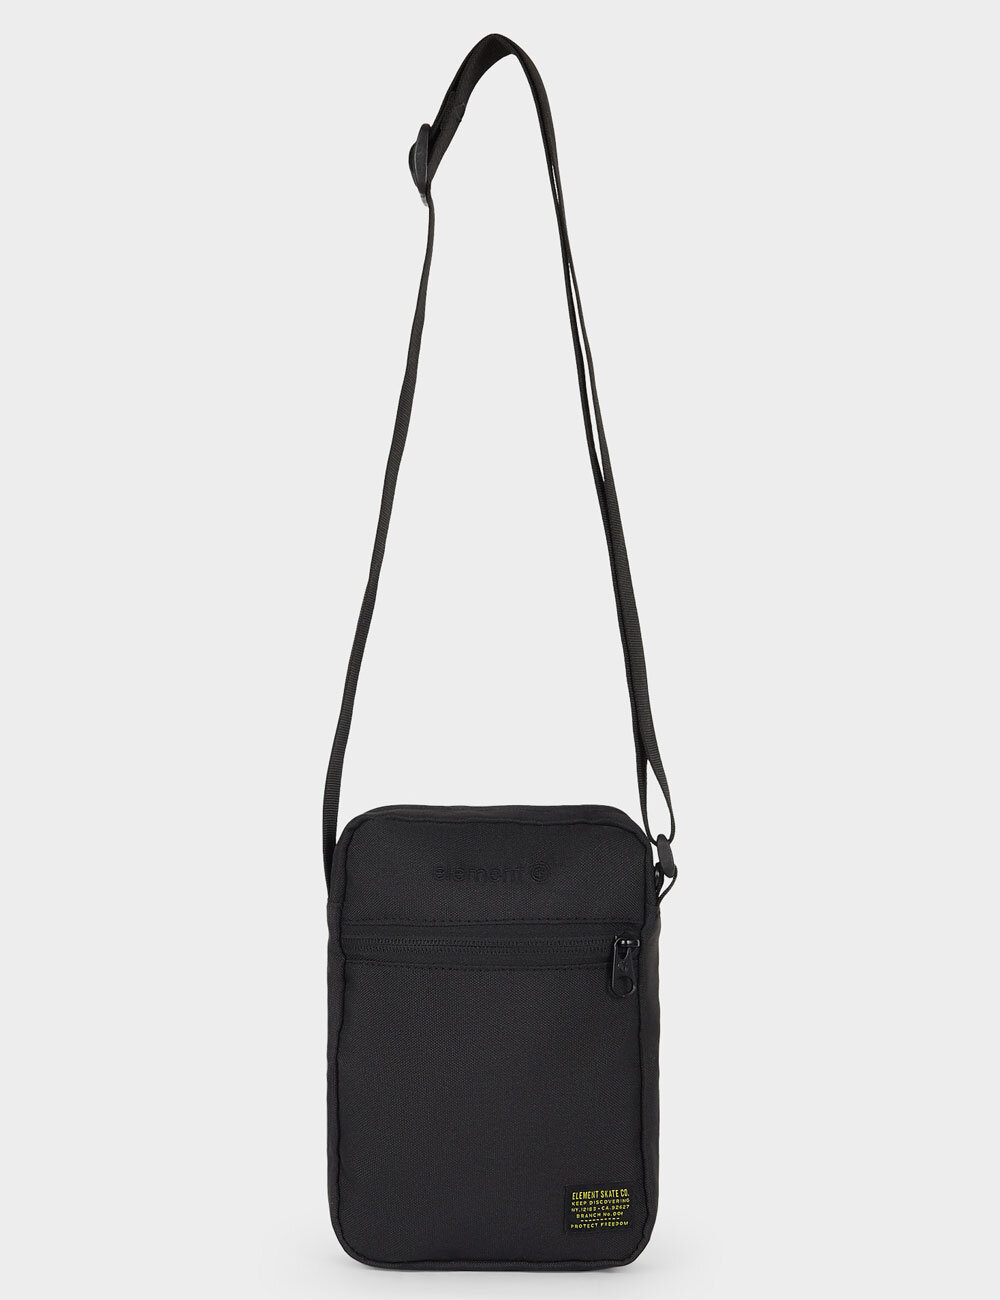 4c728e8c4f0c4 PAGER SHOULDER BAG - Men's Accessories - Shop Sunnies, Hats, Bags & More |  Backdoor - ELEMENT W19